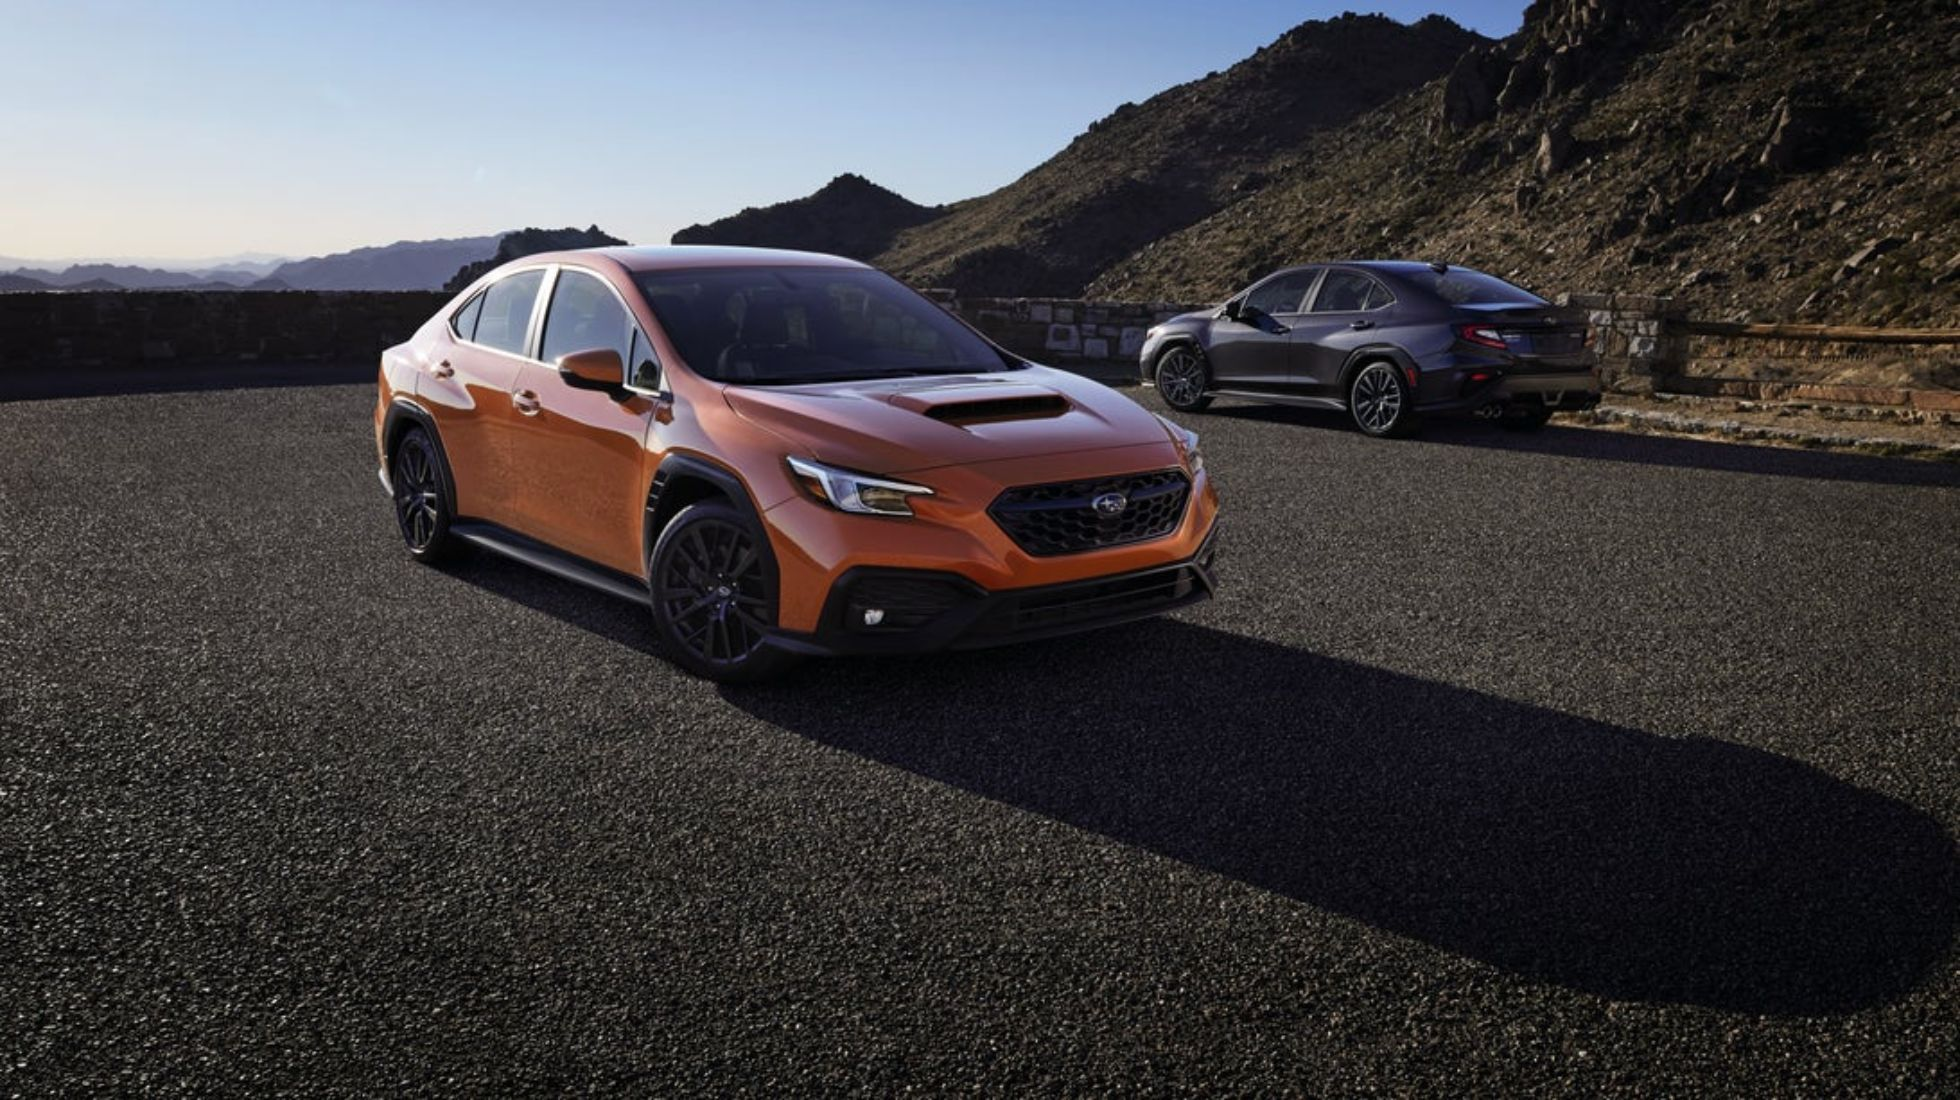 New 2022 Subaru WRX Revealed